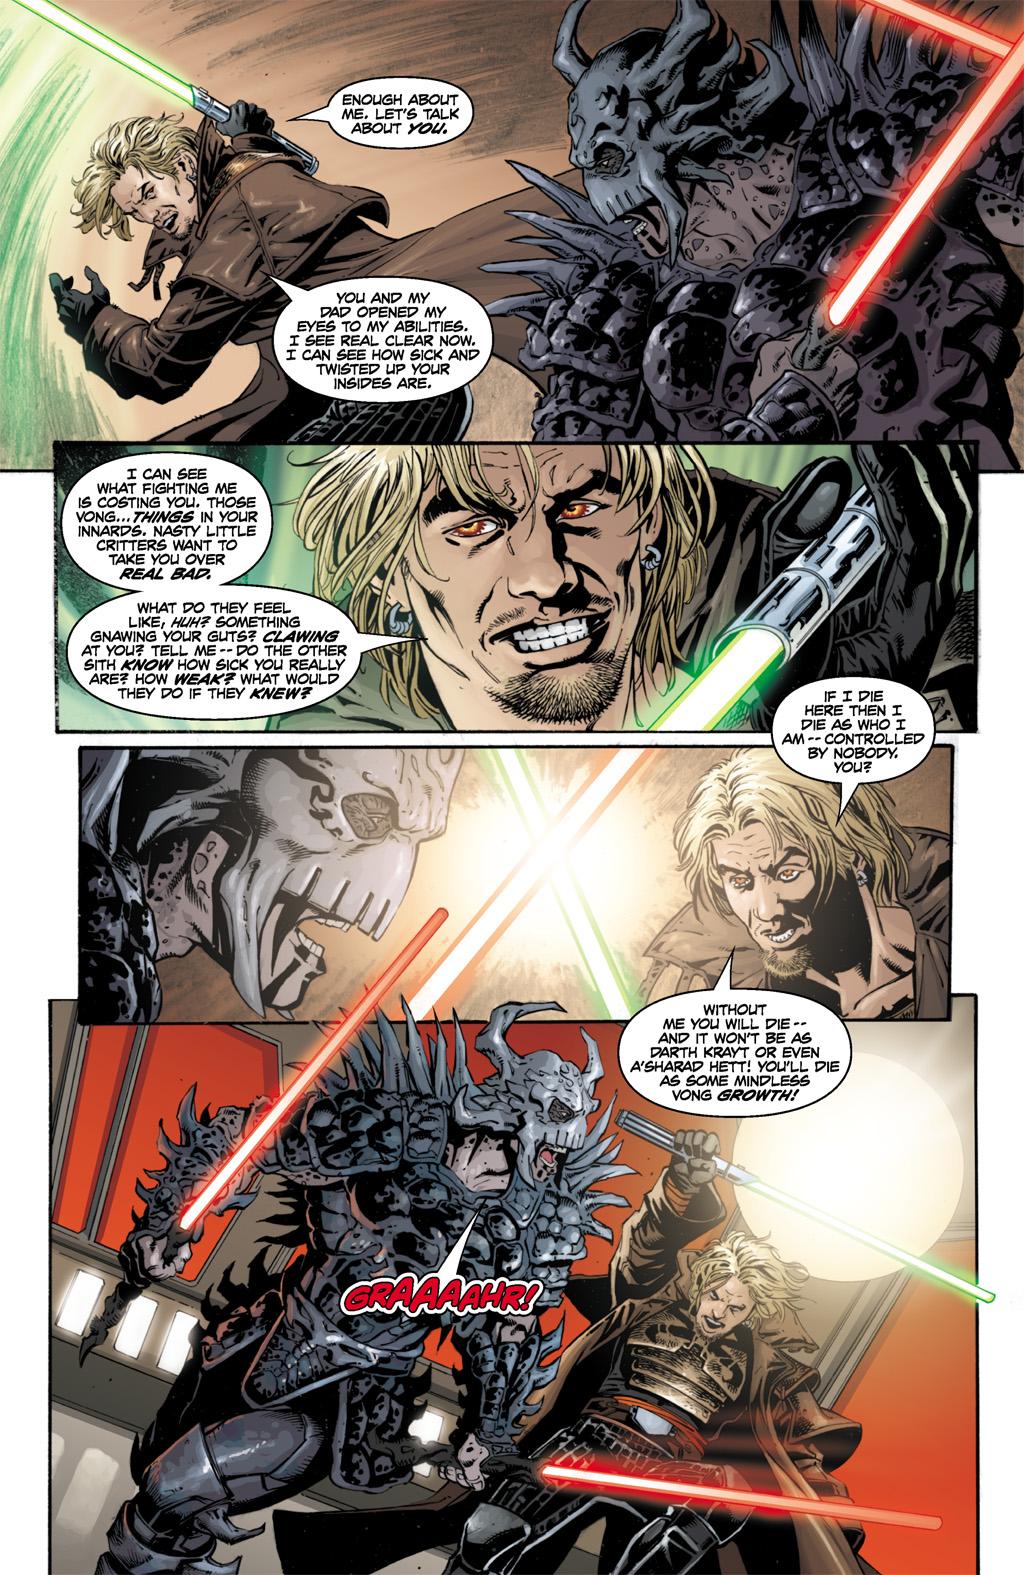 Comic-Only Fights Adapted To Novel Format Nc2j-0-z87kuO-kf7CH5-Yf85GuStoymLOeaxrPKqC59yhMtvN-q5yrCDUwFCr-v-y5eXAFQrlSu=s1600